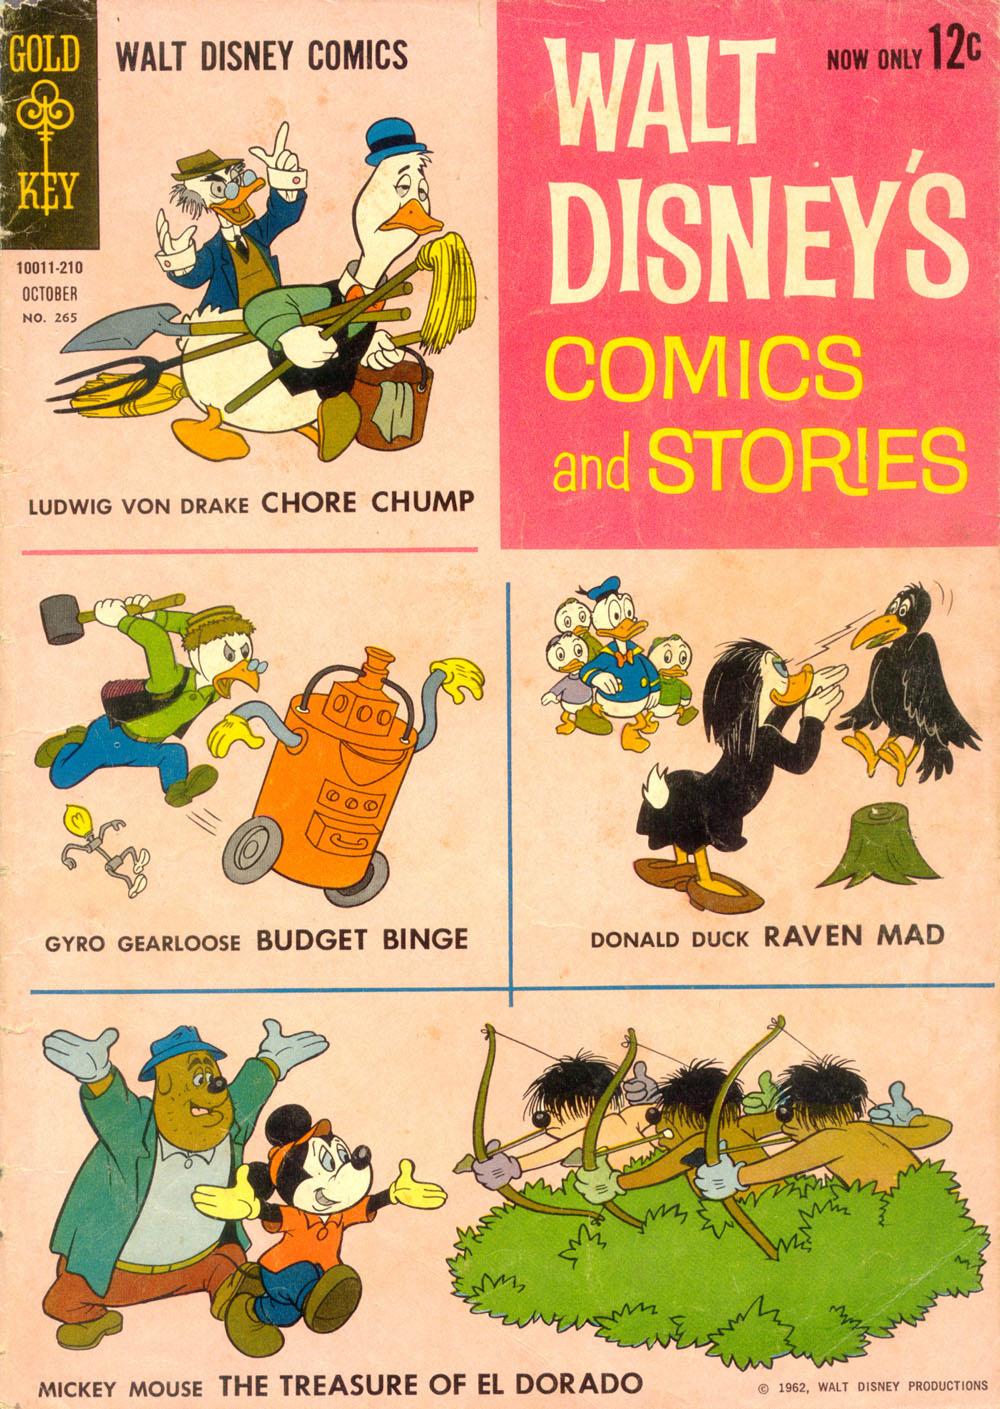 Walt Disneys Comics and Stories 265 Page 1